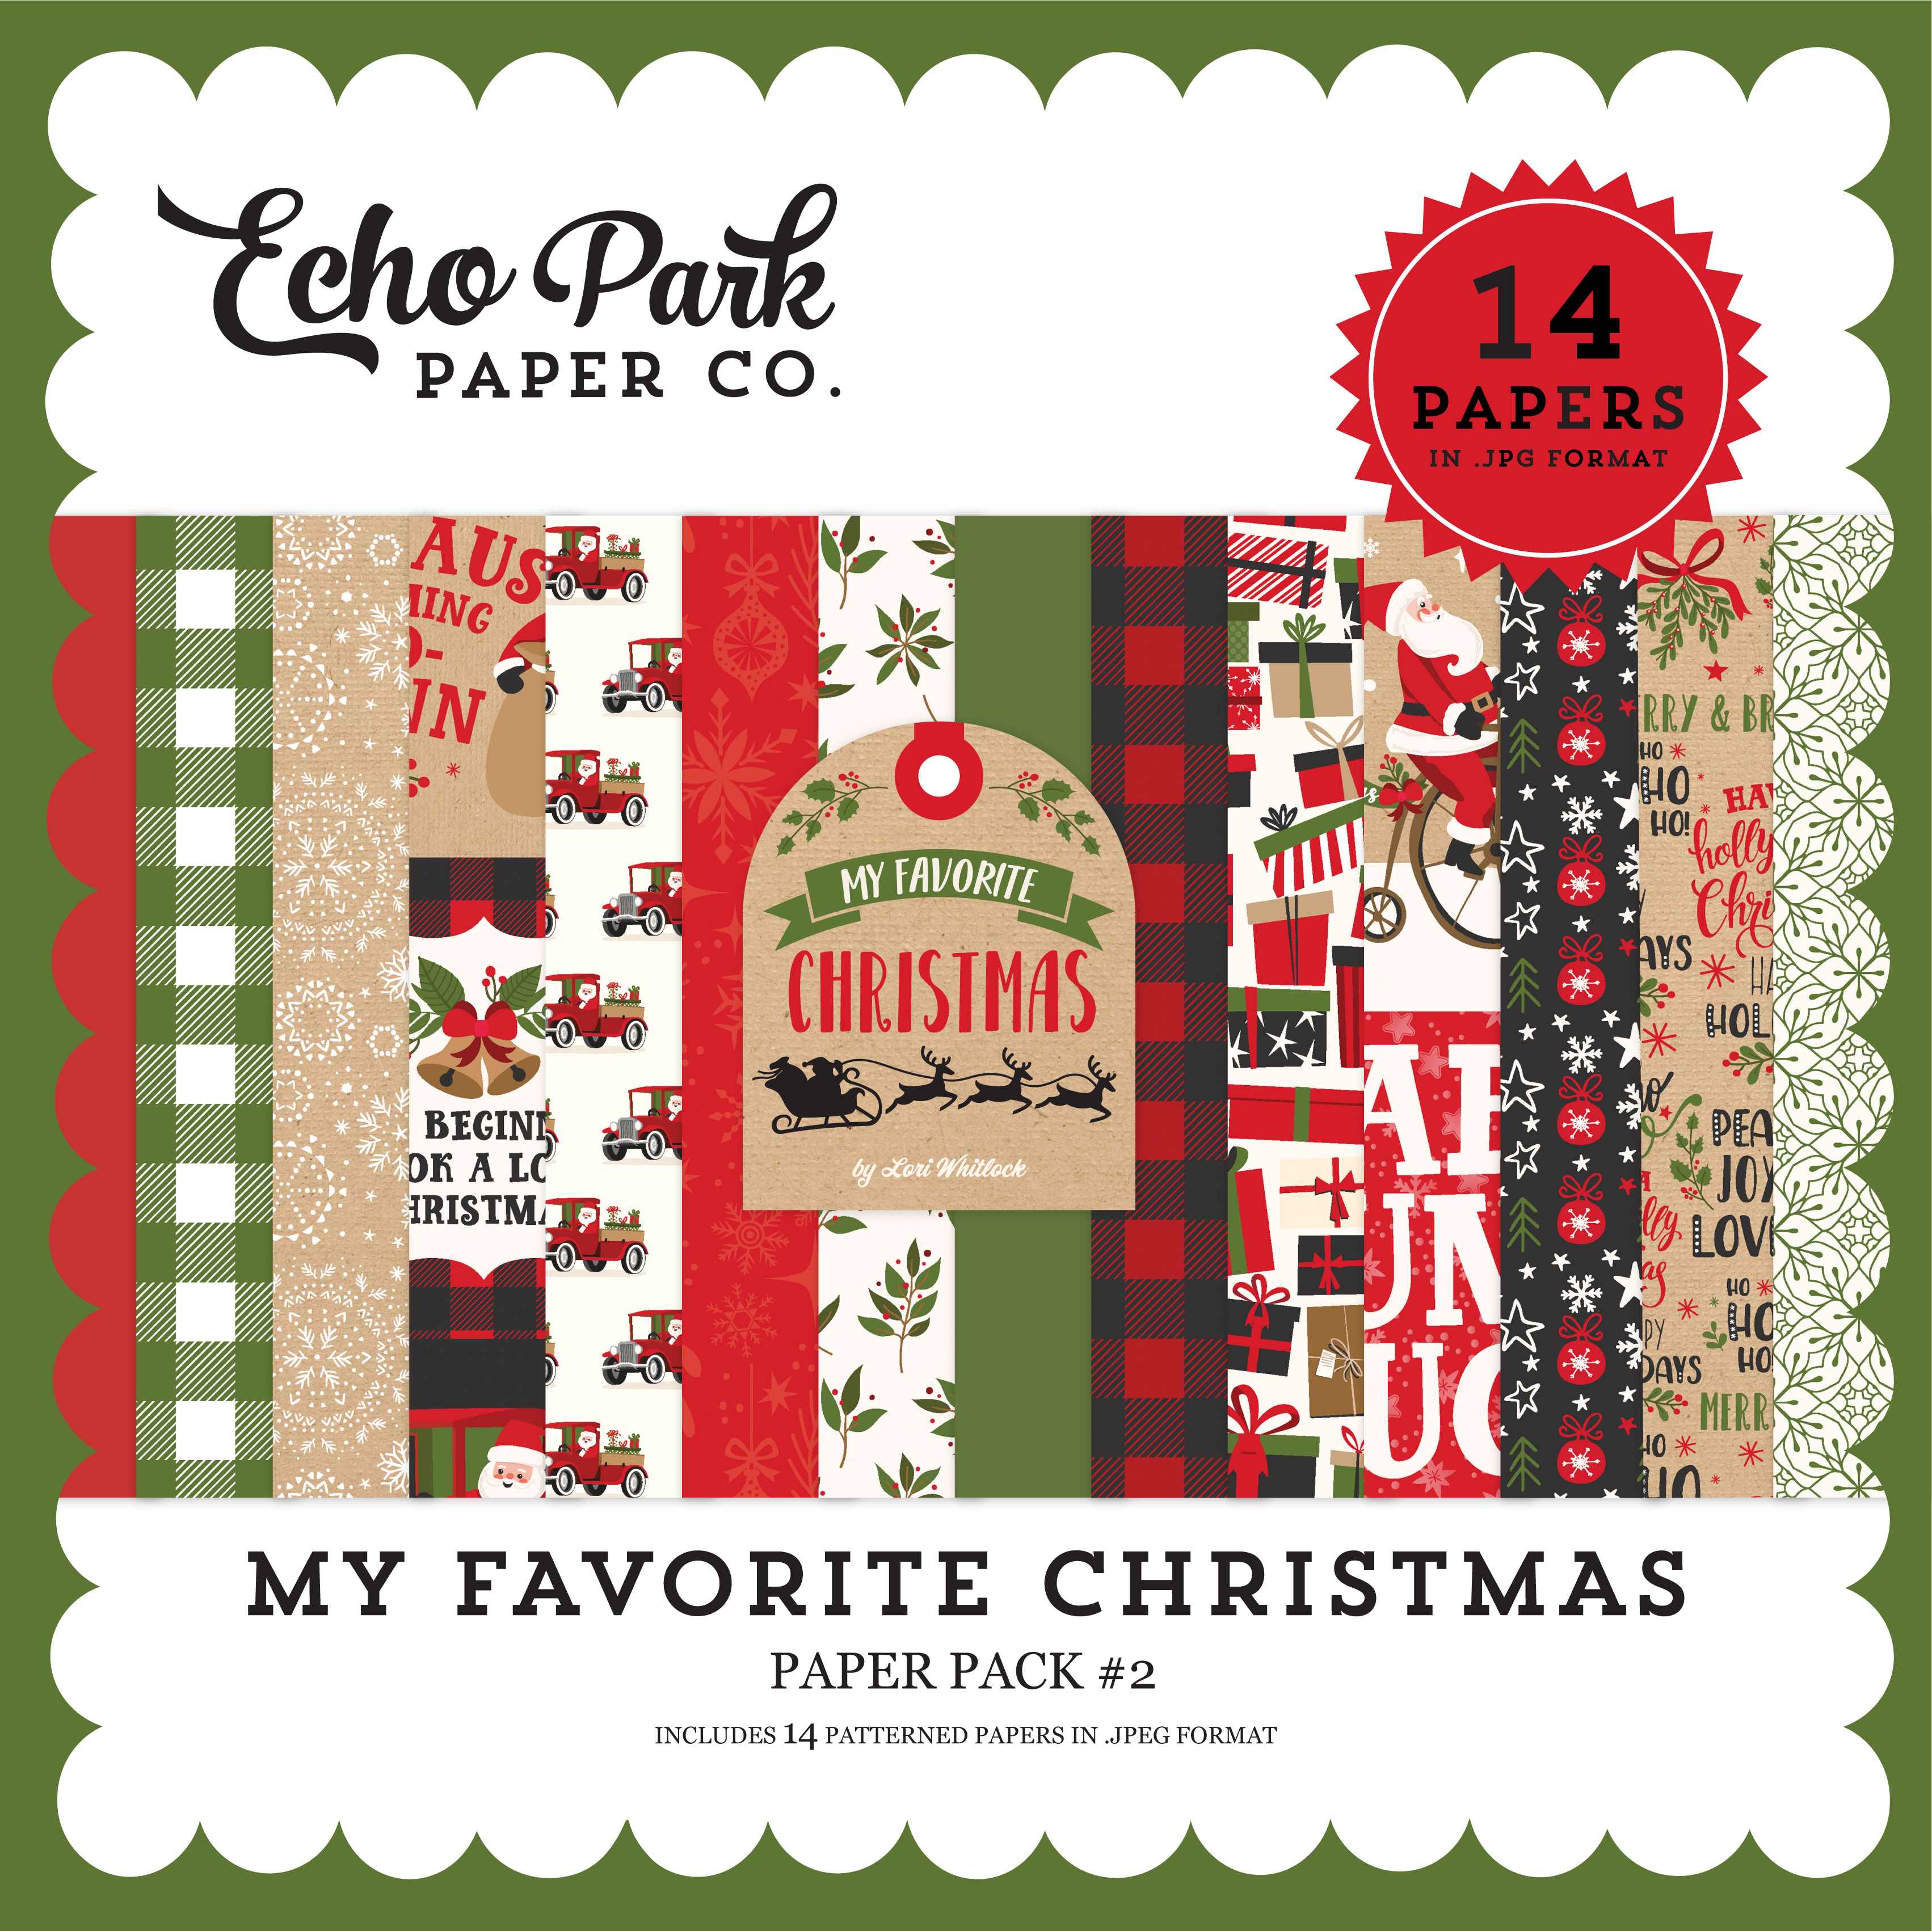 My Favorite Christmas Paper Pack #2